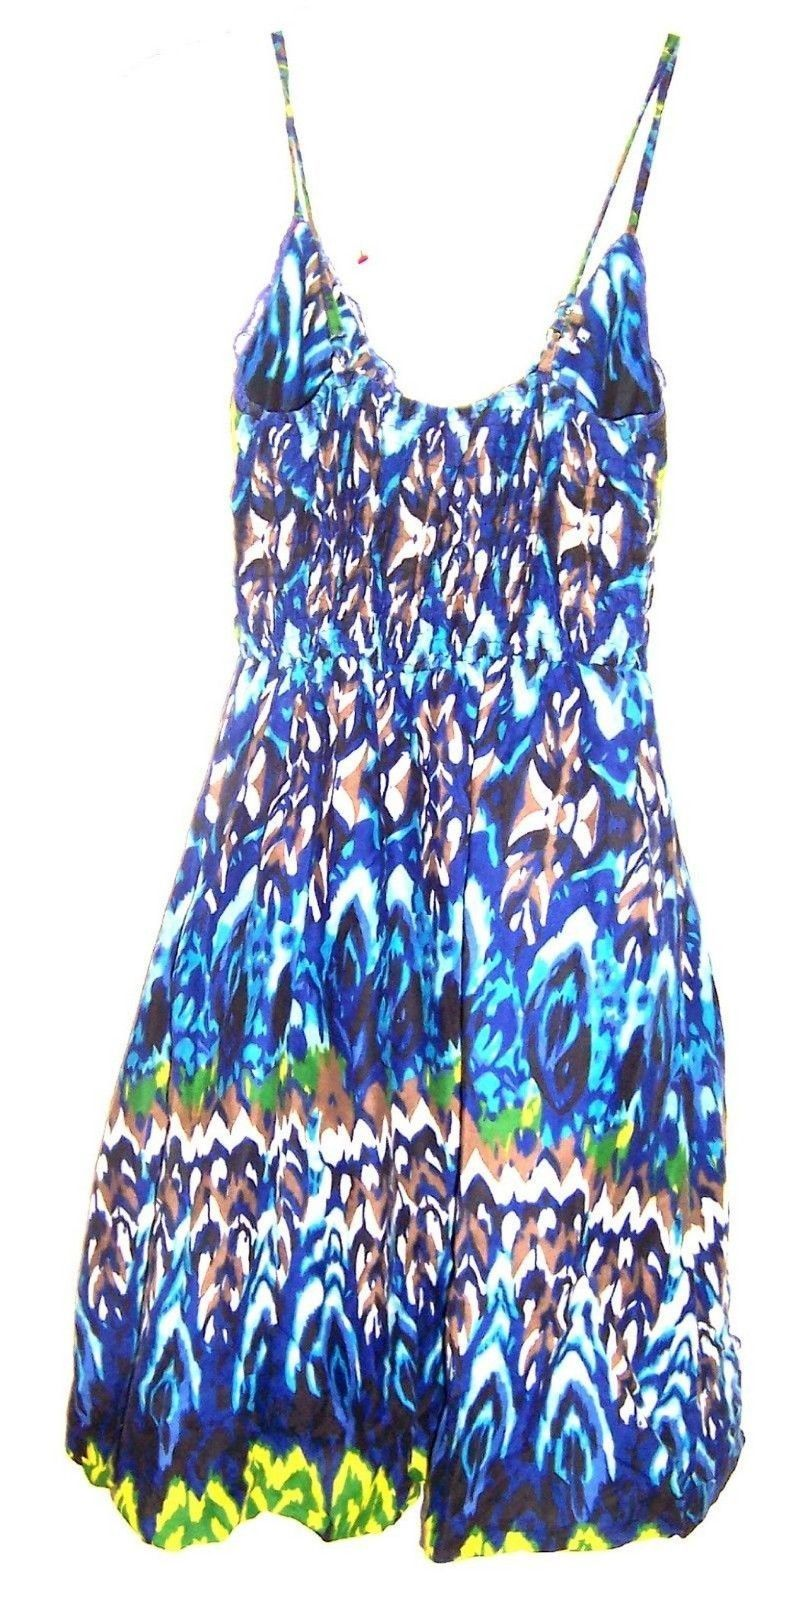 Sz XS-M - She's Cool Blue Tie Dye Batik look Sundress Stretch Dress